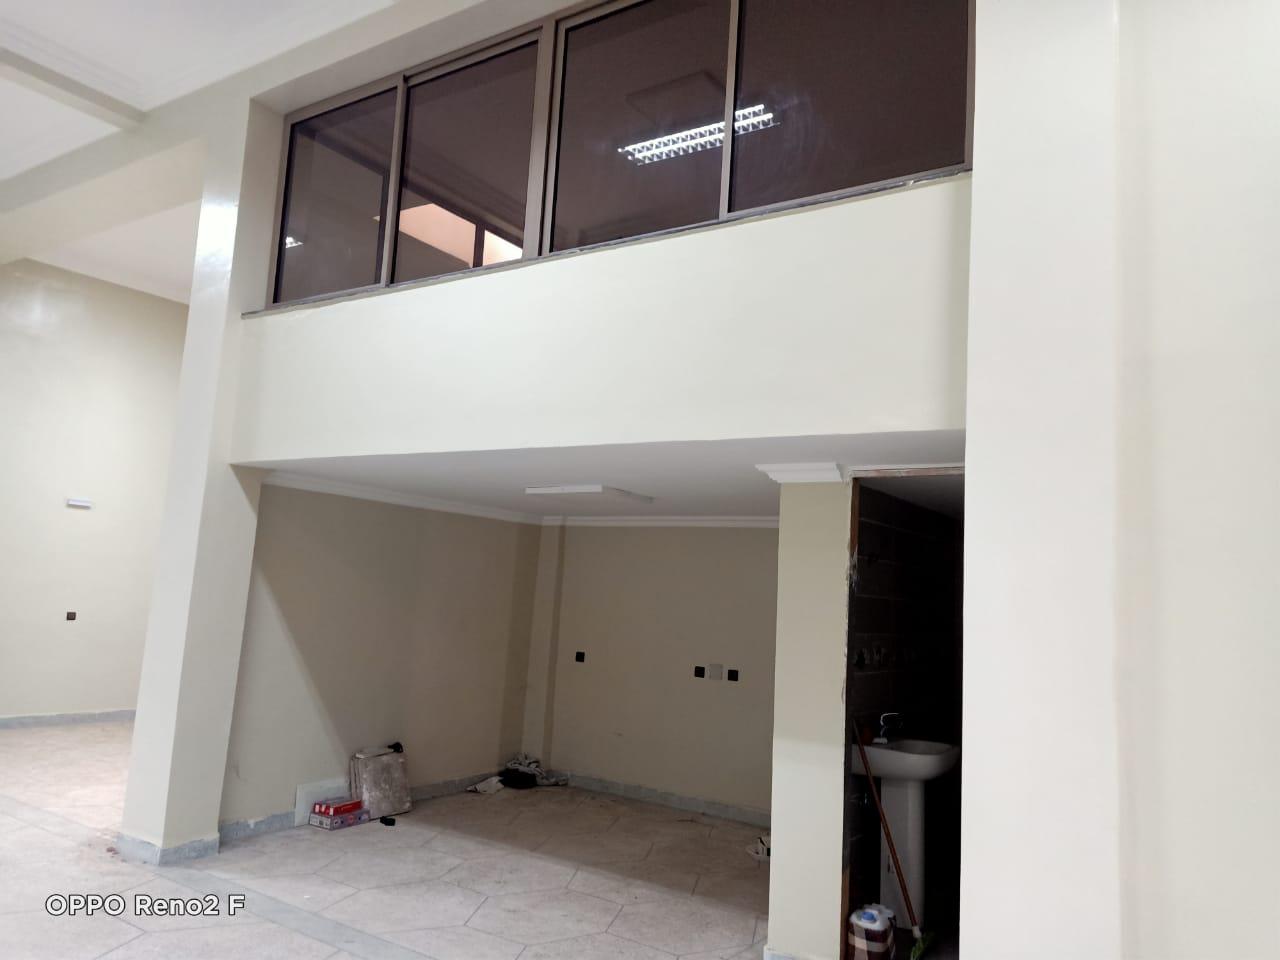 magasin en location 400 m² en plein quartier industriel